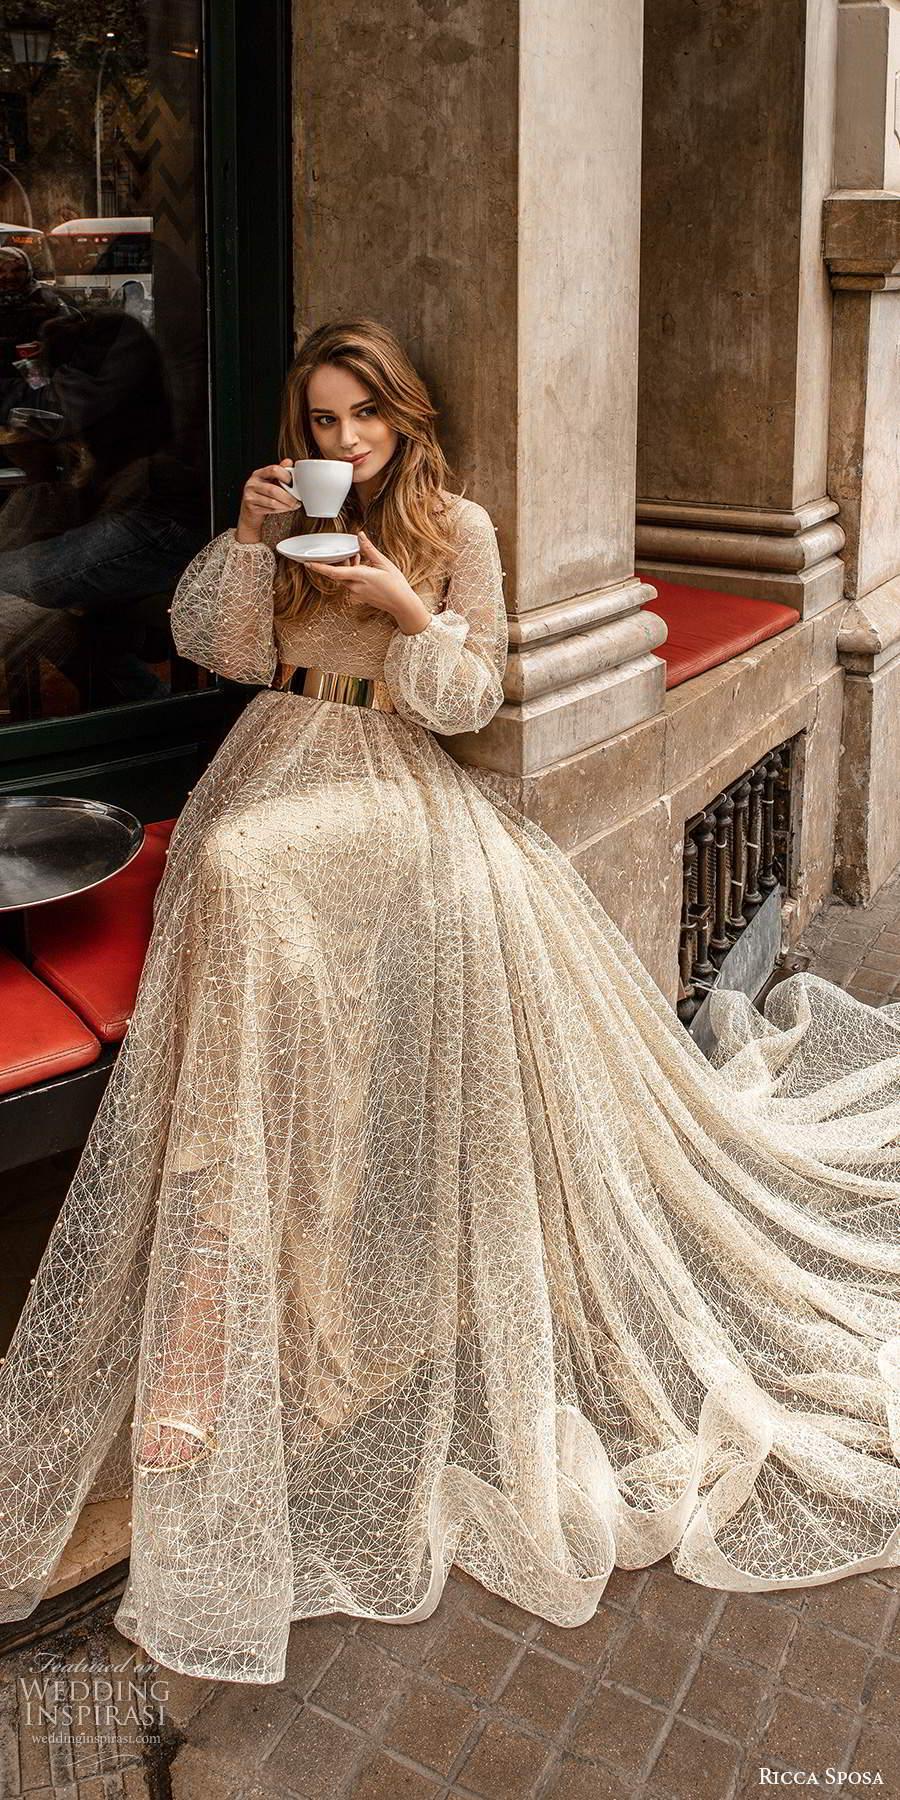 ricca sposa 2020 barcelona bridal sheer bishop sleeves scoop neckline fully embellished glitzy glam a line wedding dress metallic gold belt chapel train (12) sv